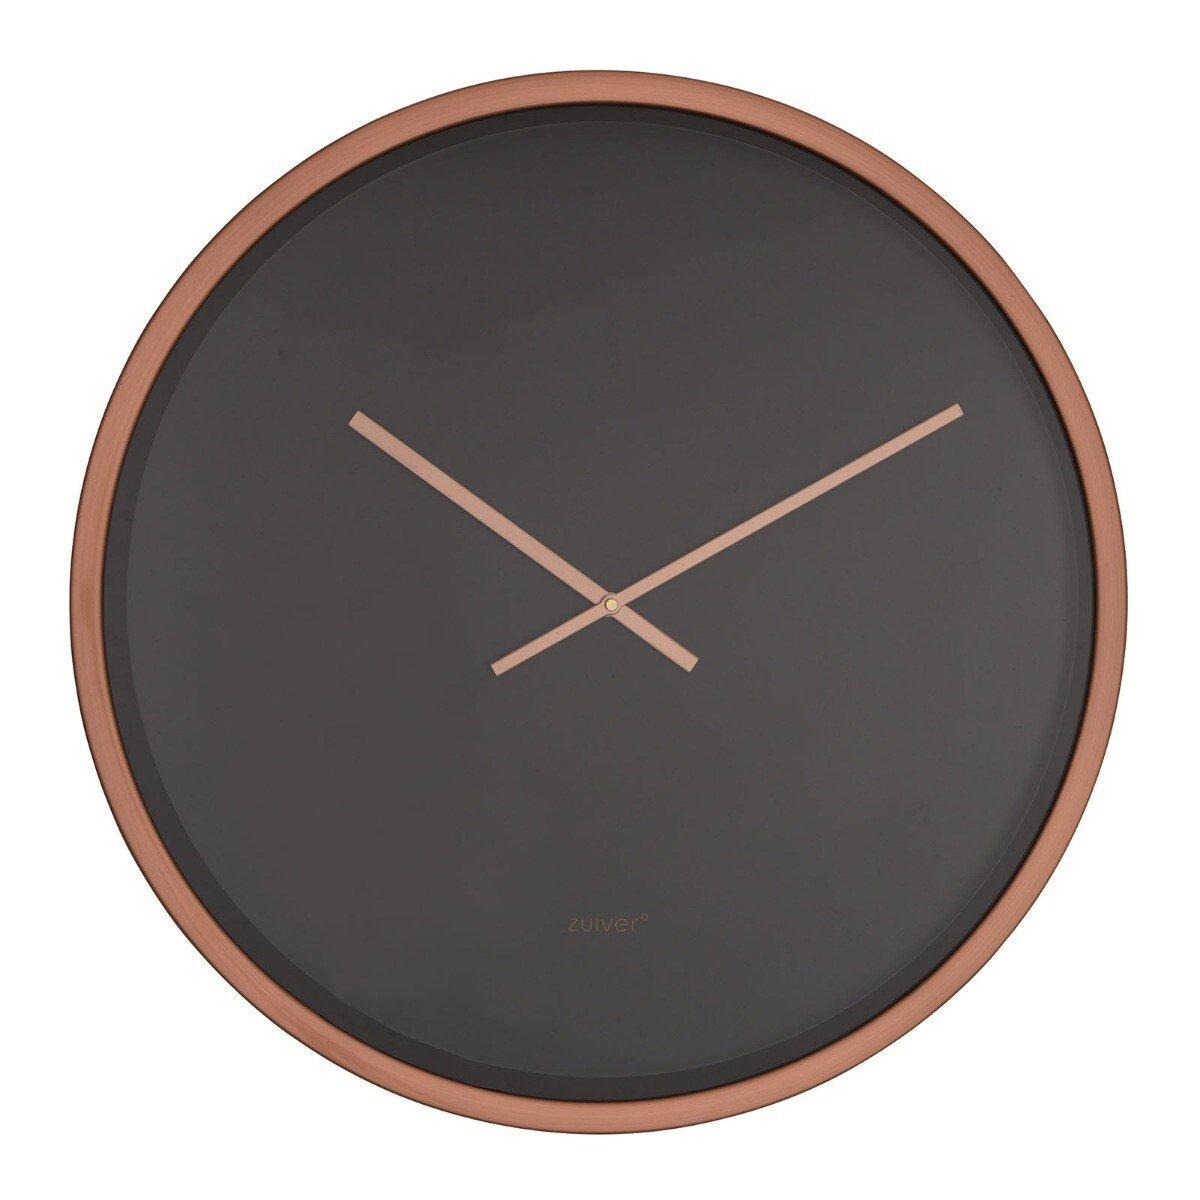 Zuiver Klok Bandit Time koper �60 x 5